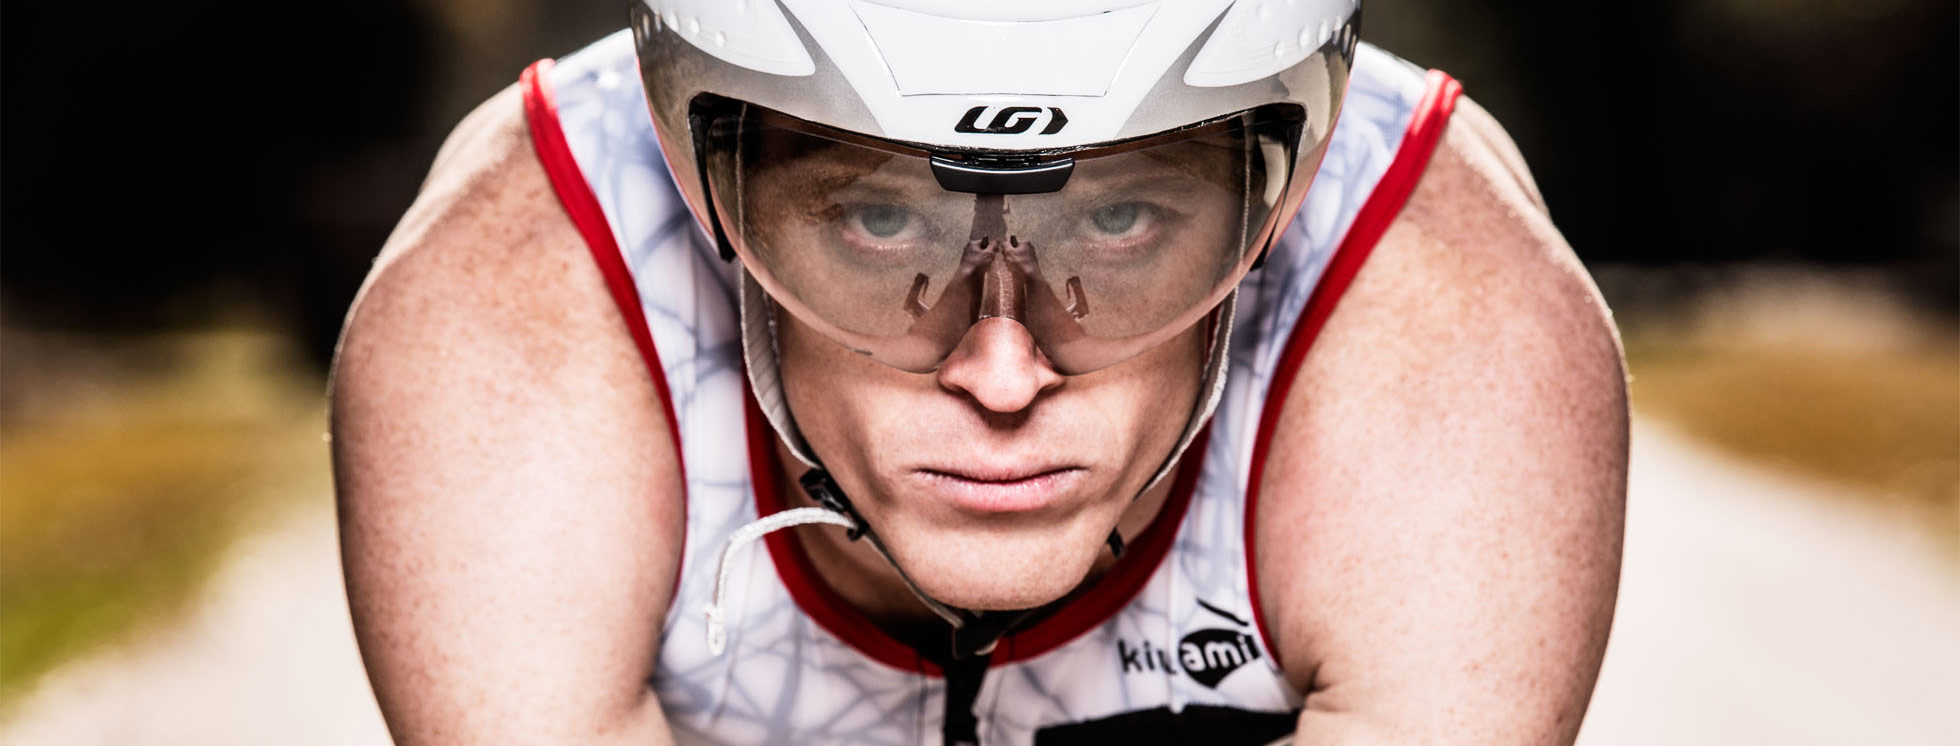 Behind the Scenes: Matt Hanson – Ironman Champion